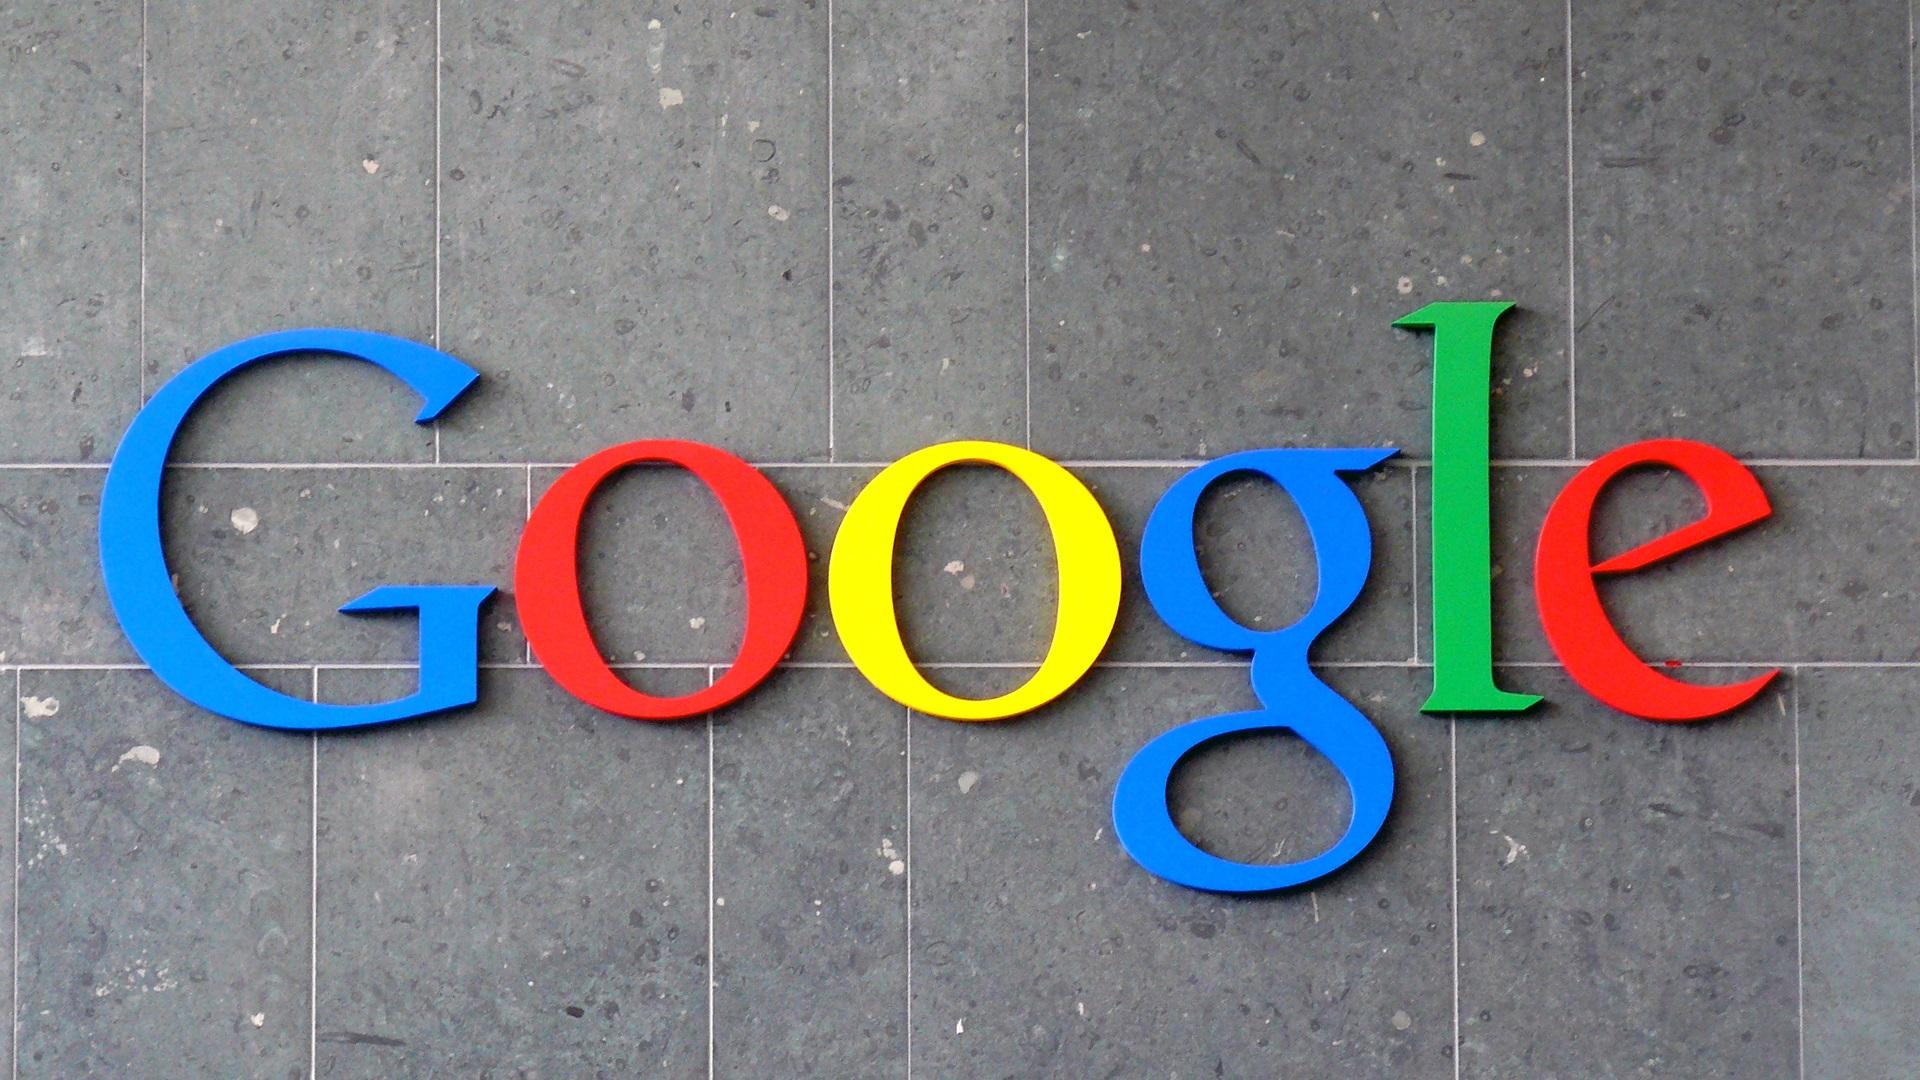 Google on wall